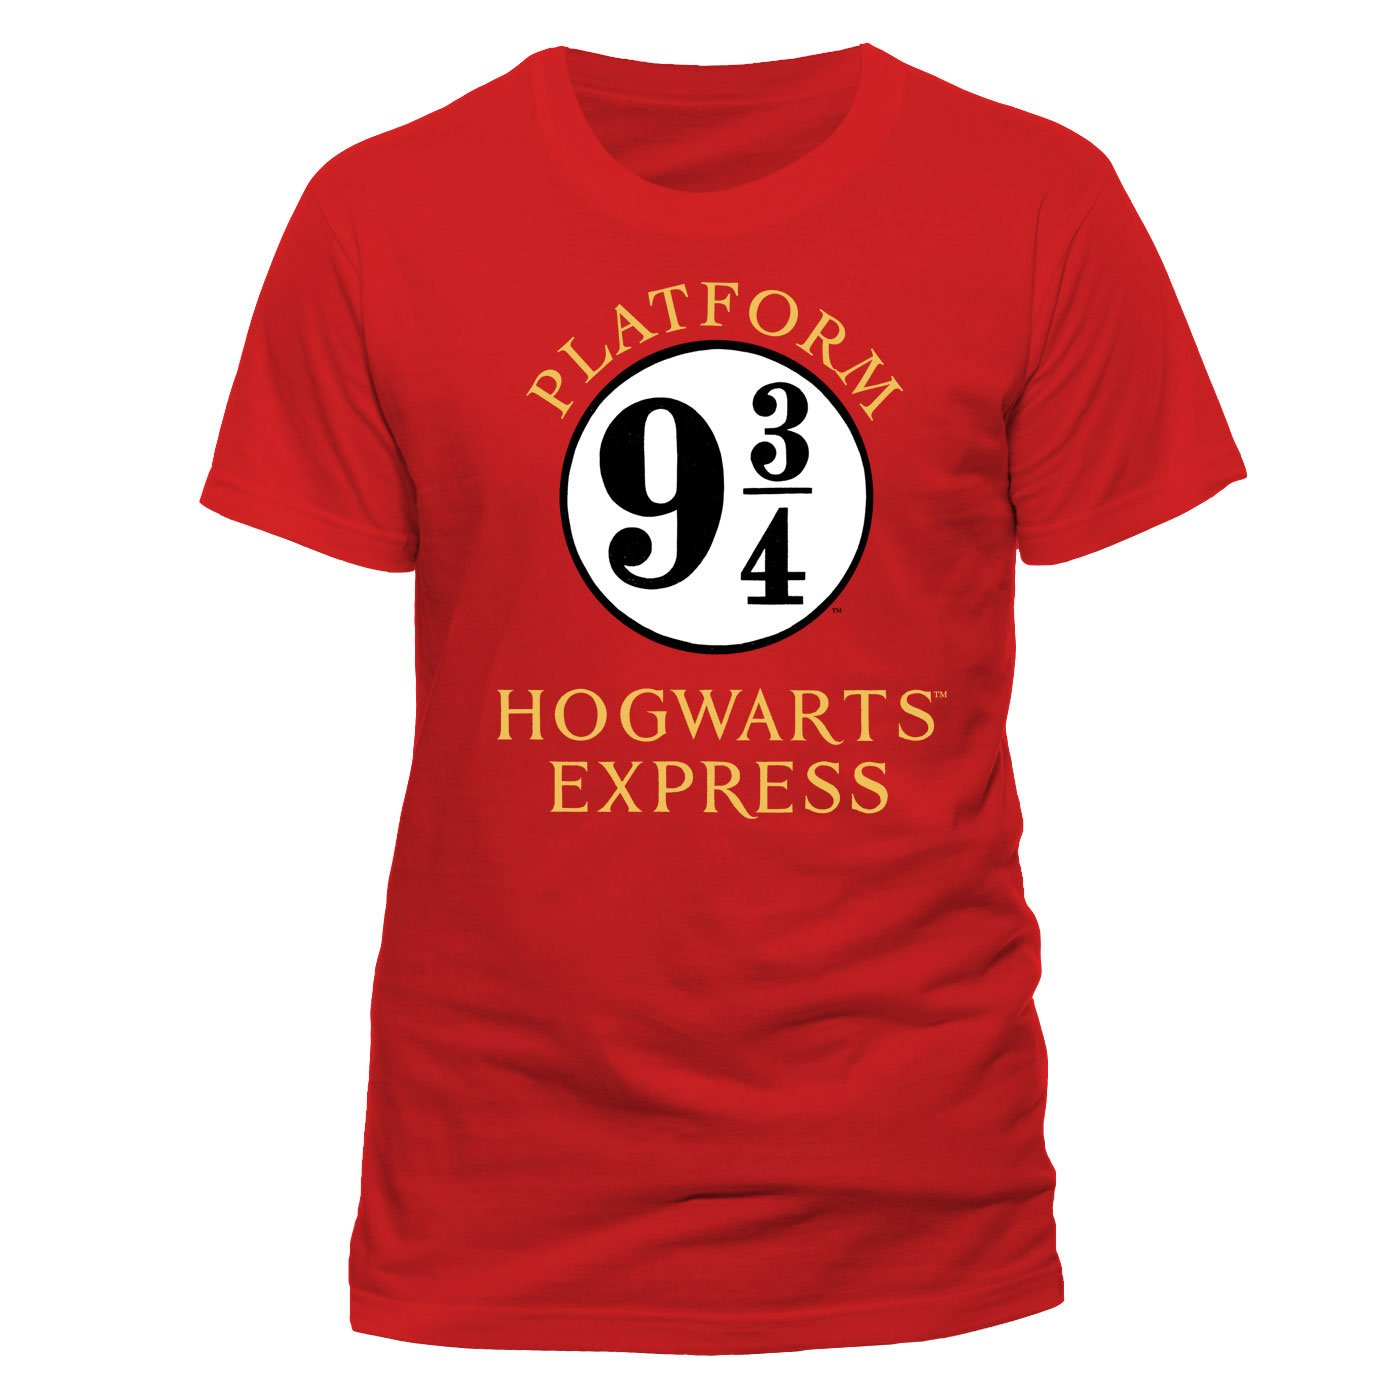 Harry Potter T-Shirt Platform 9 3/4 Size M